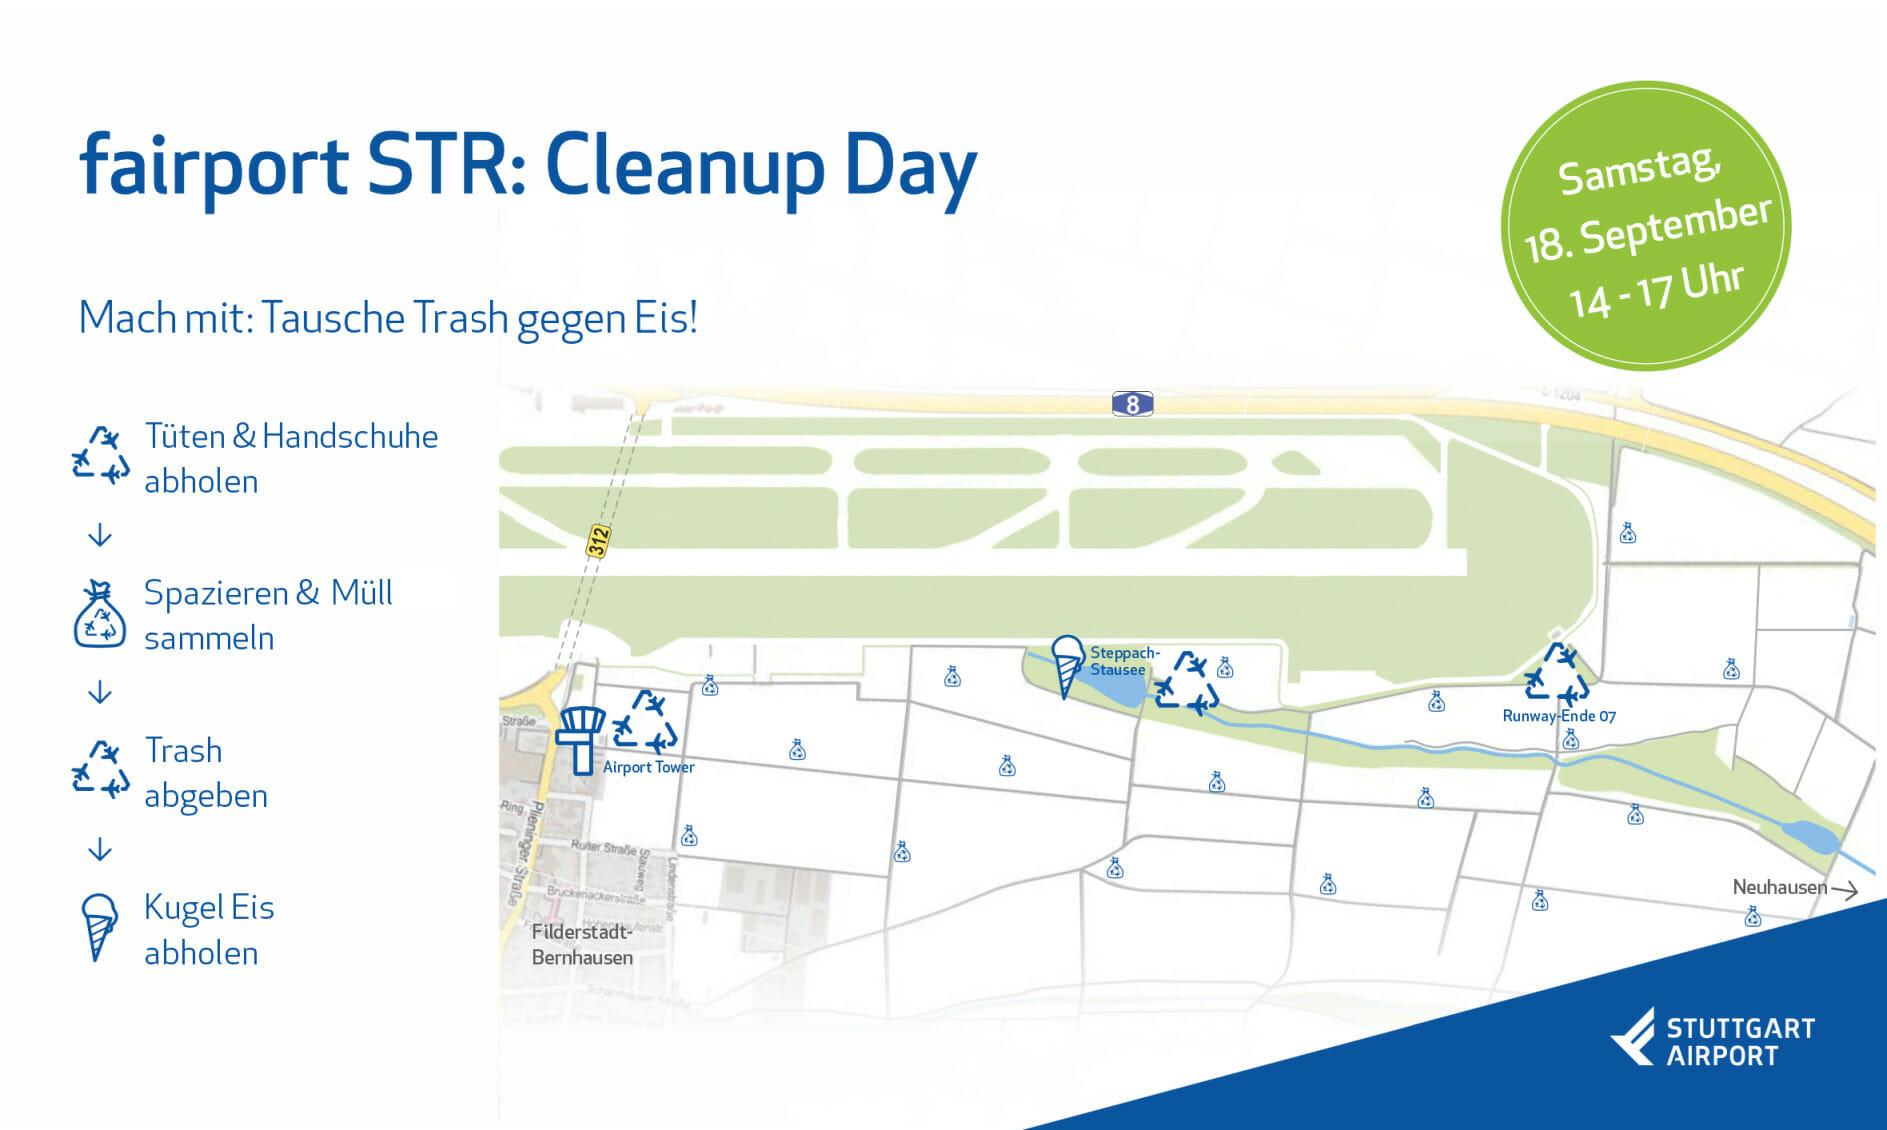 fairport STR Cleanup Day (Baden-Württemberg)